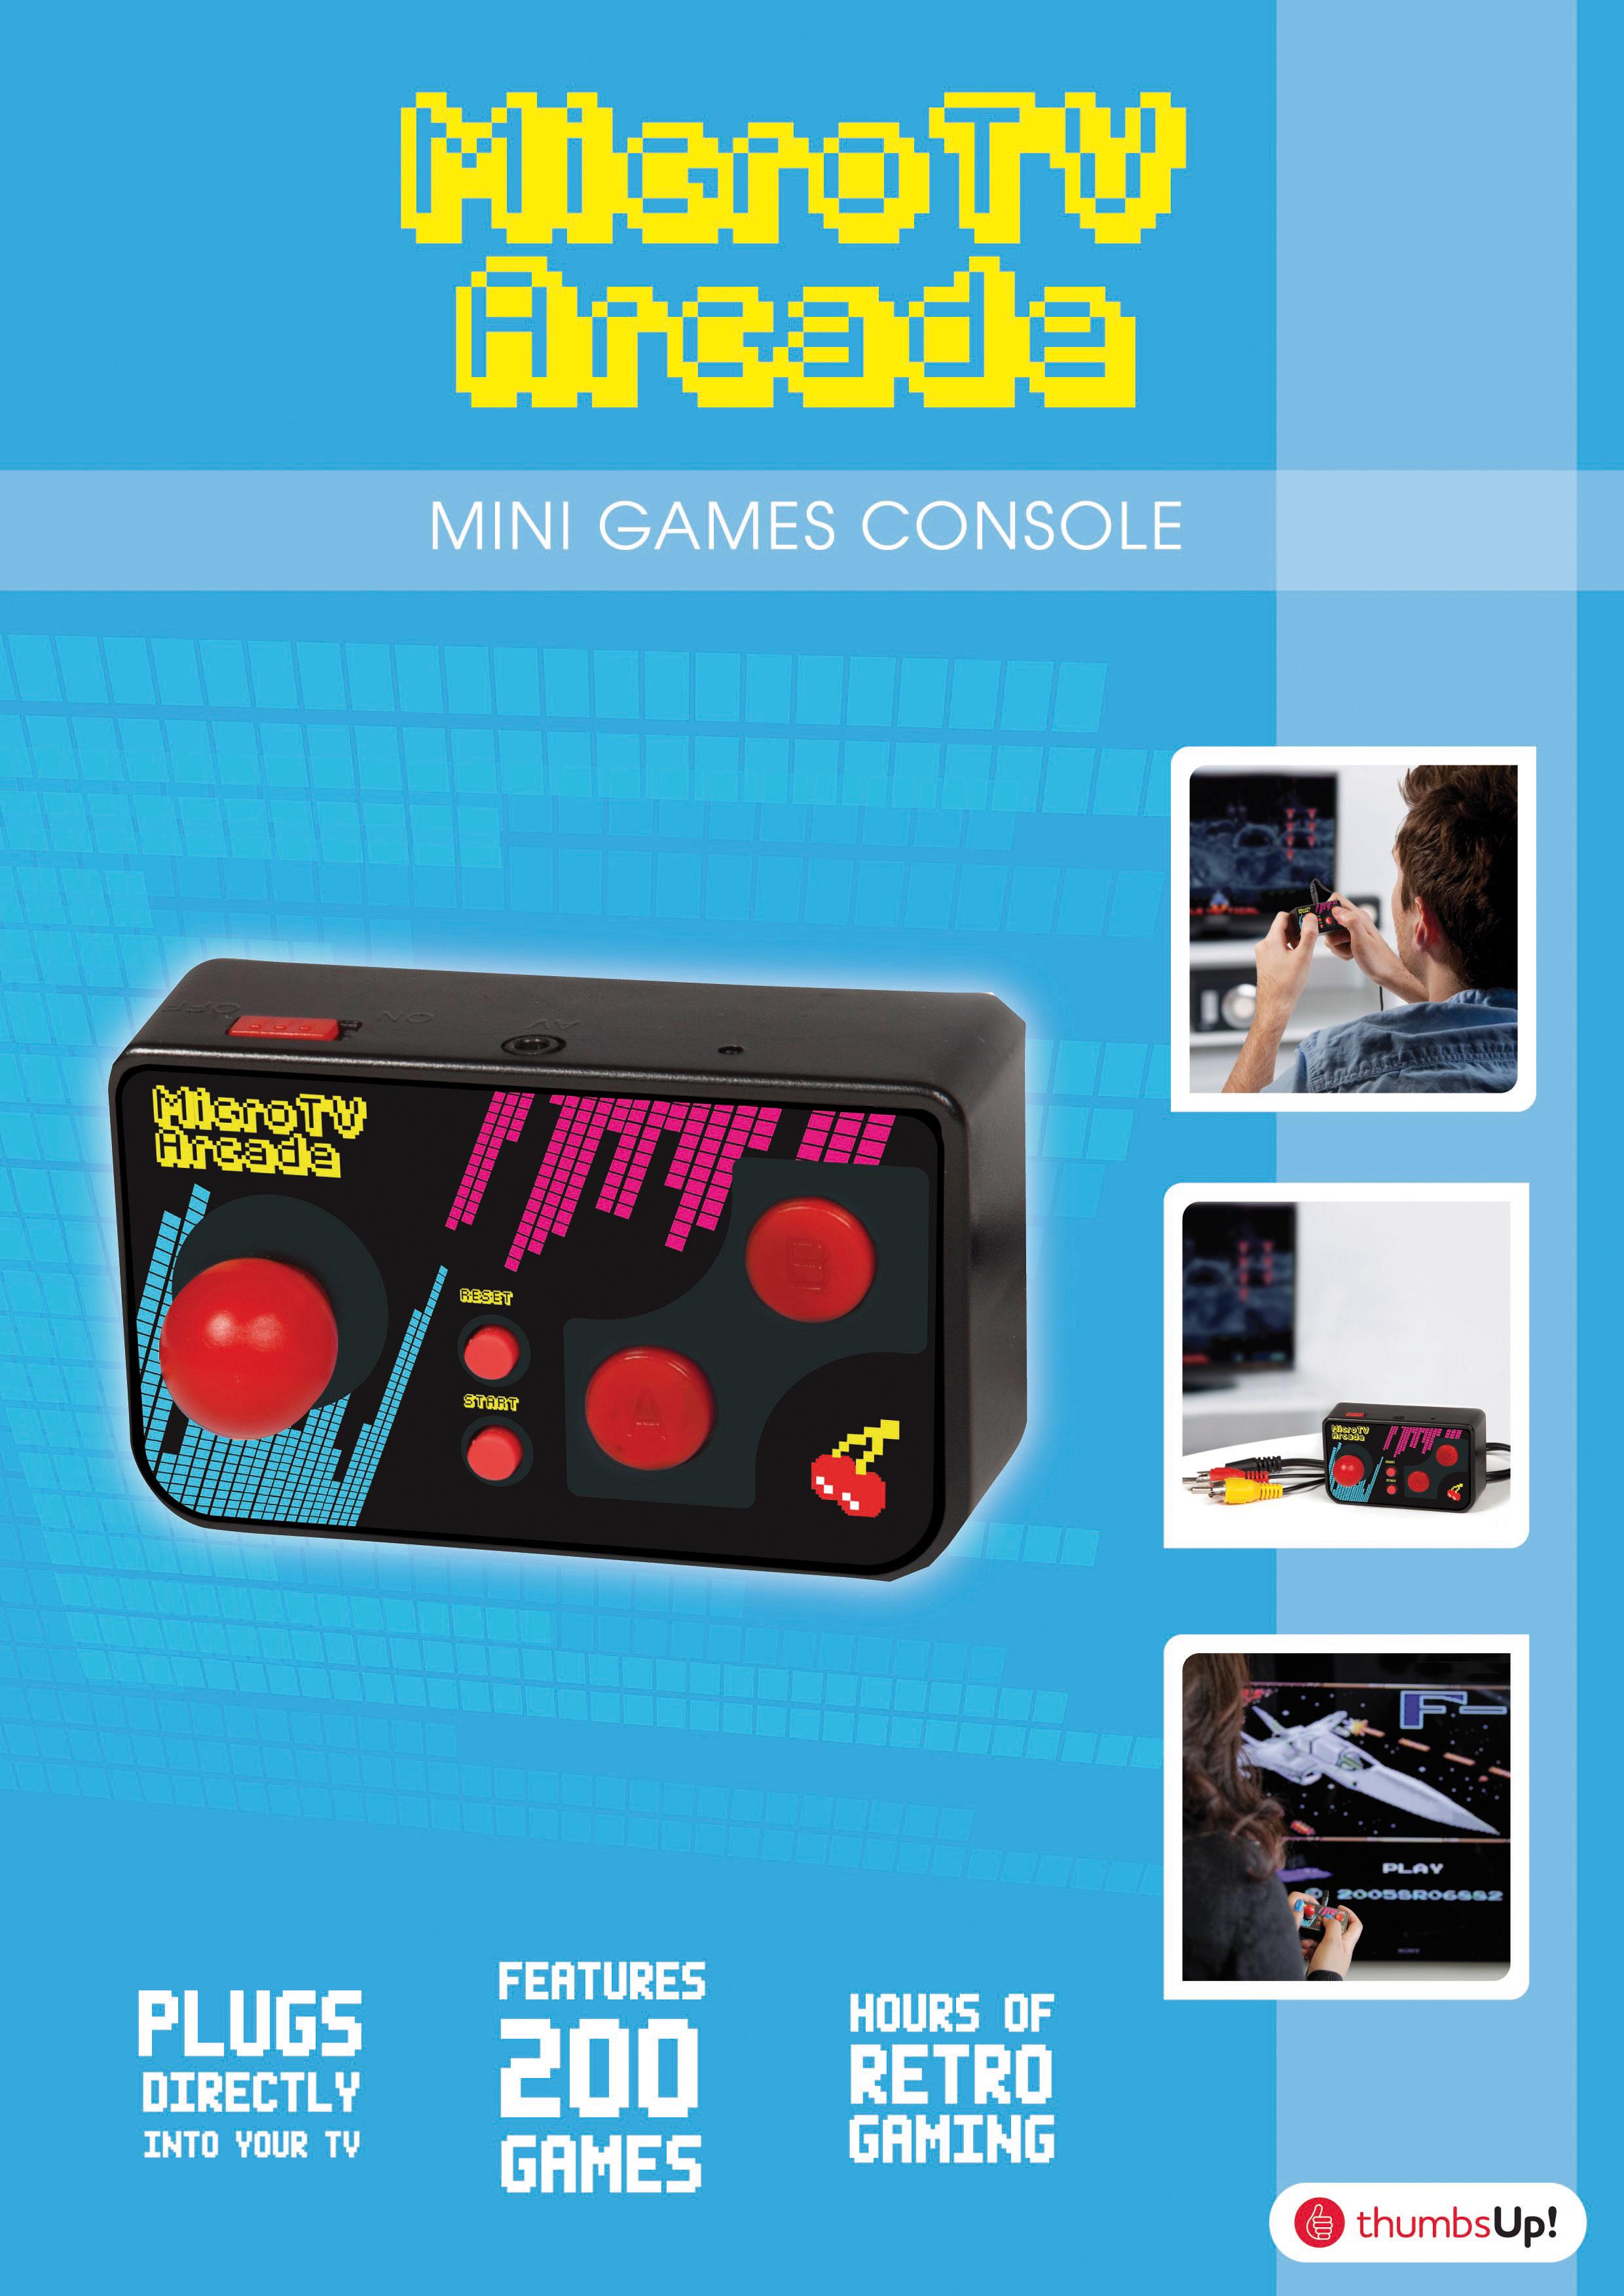 thumbs-up-microtv-arcade-mini-games-console_scorpio-worldwide_travel-retail-distributor